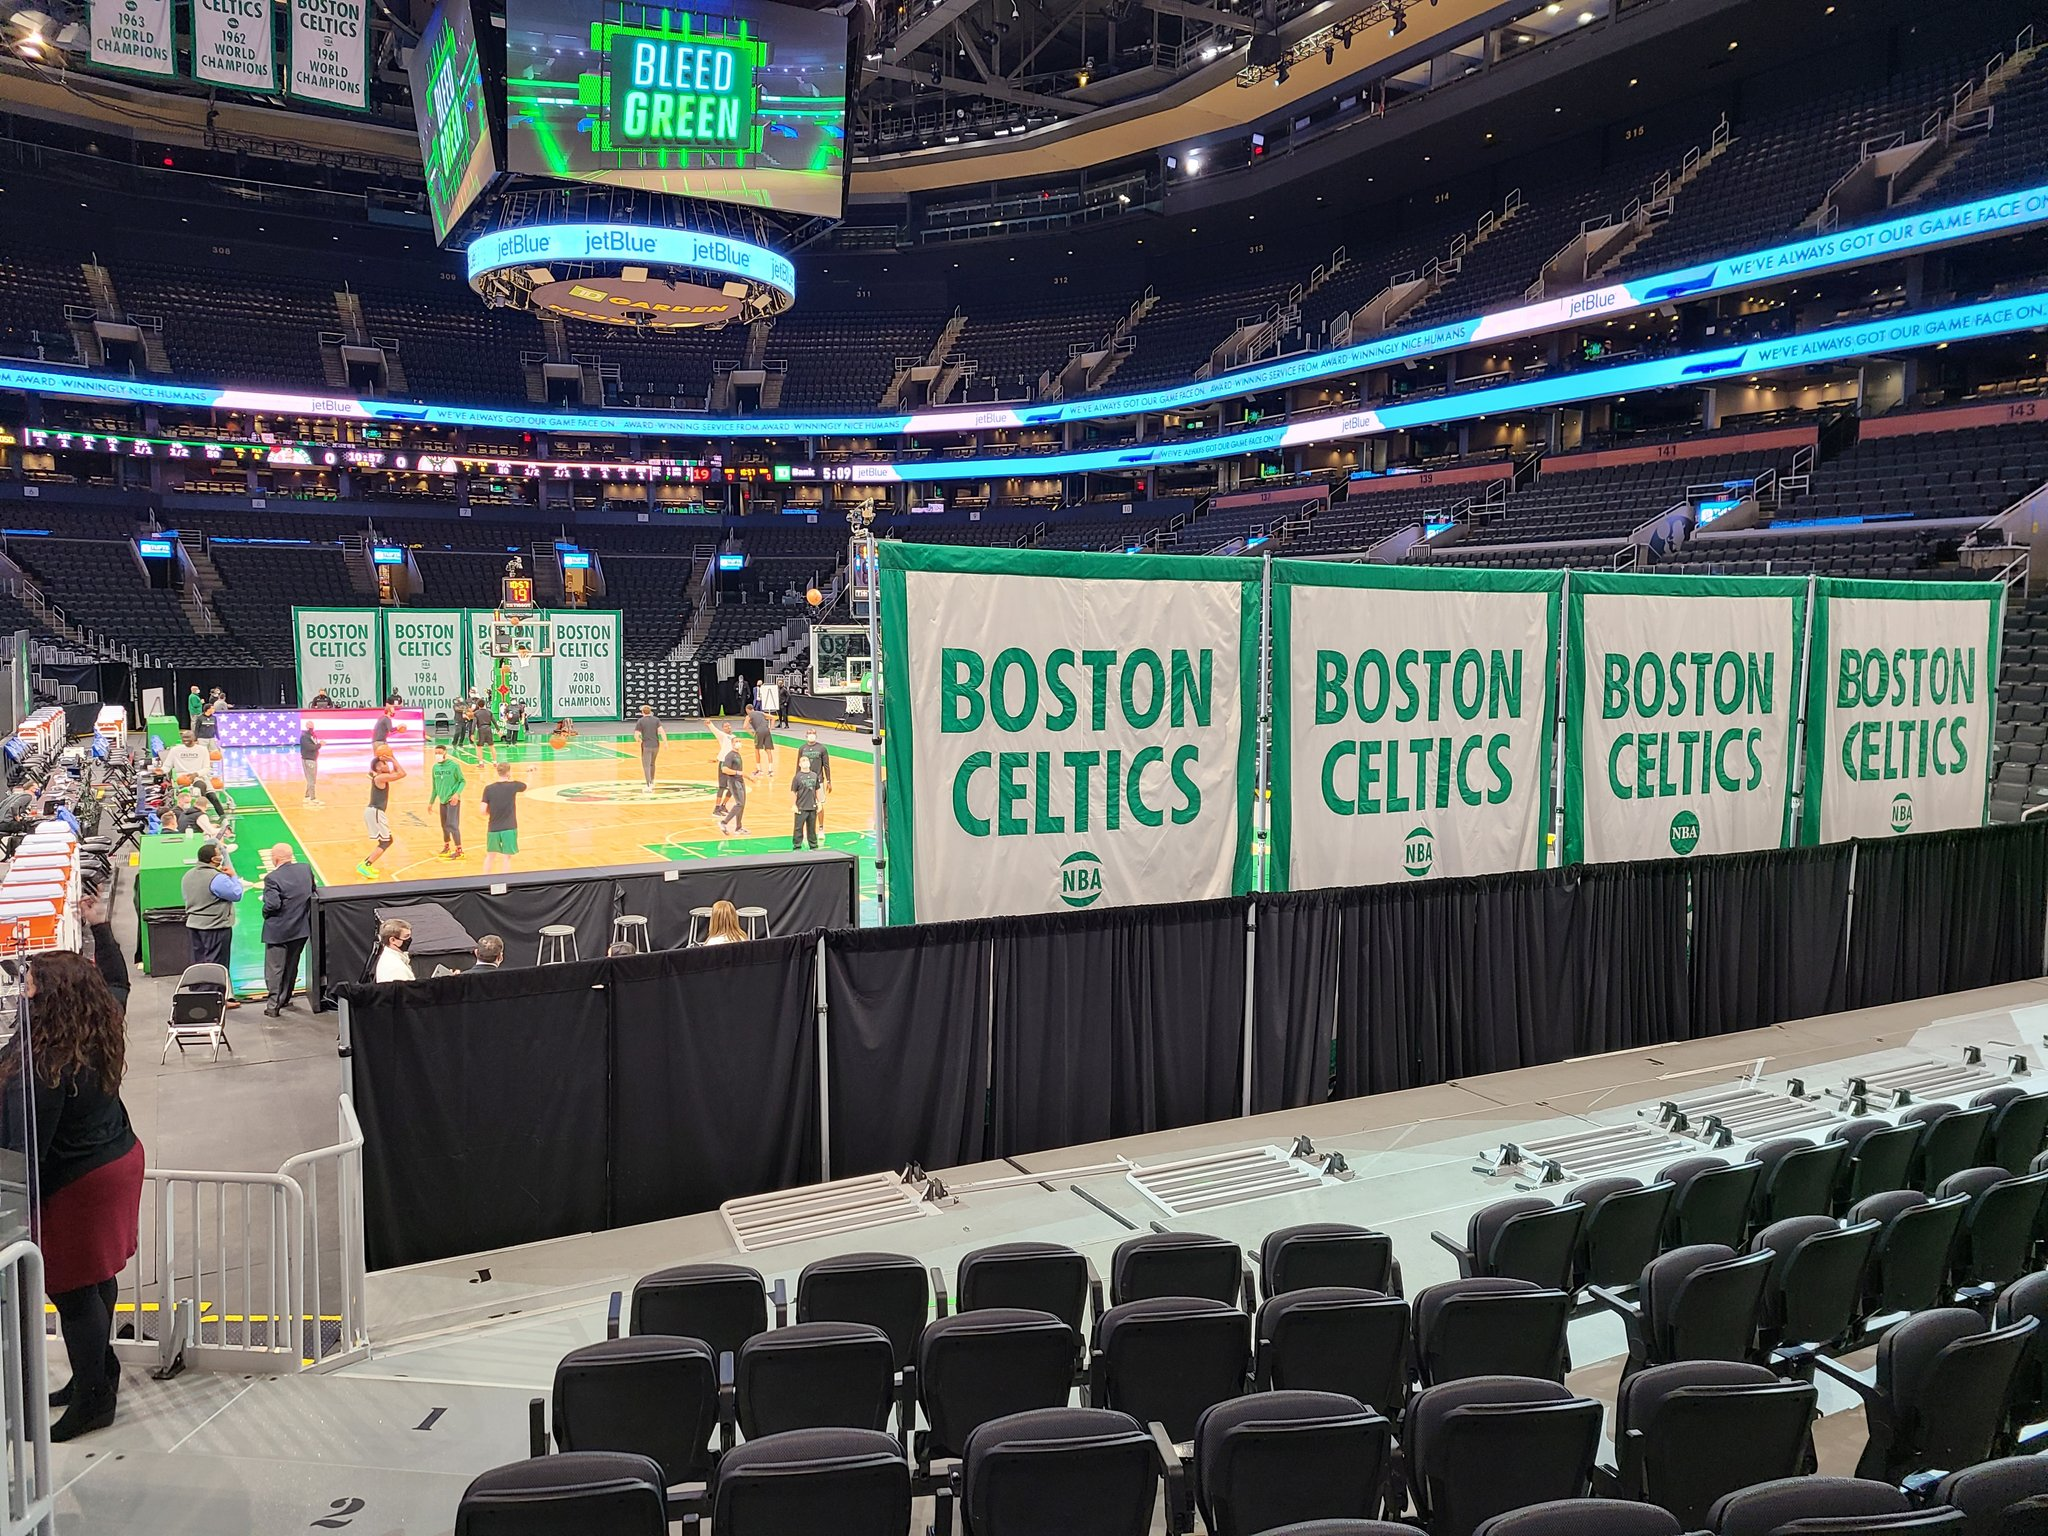 Boston Celtics vs. Milwaukee Bucks: 3 thoughts, including honoring Tommy Heinsohn